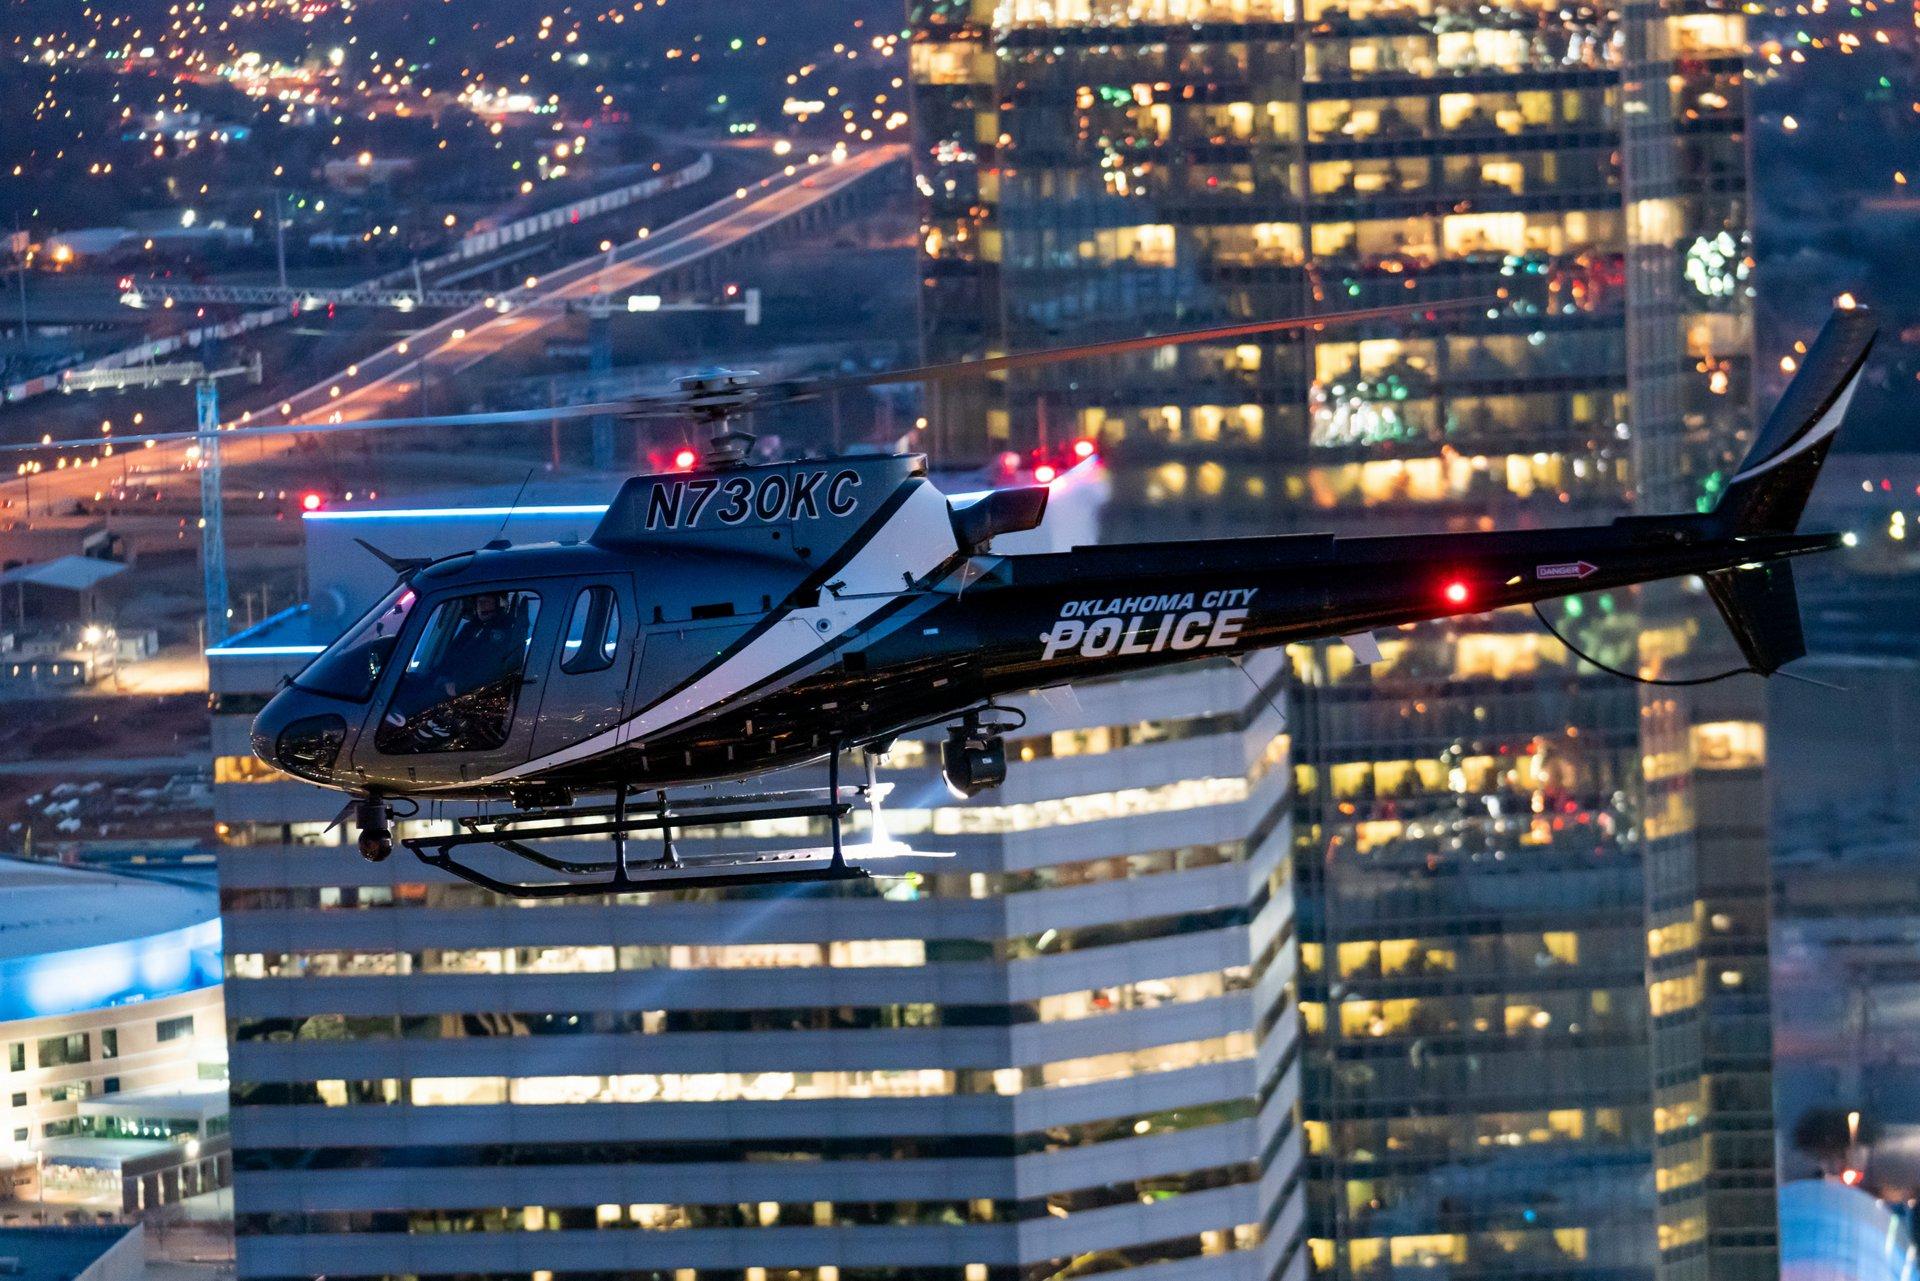 Urban Night Flight and Emergencies